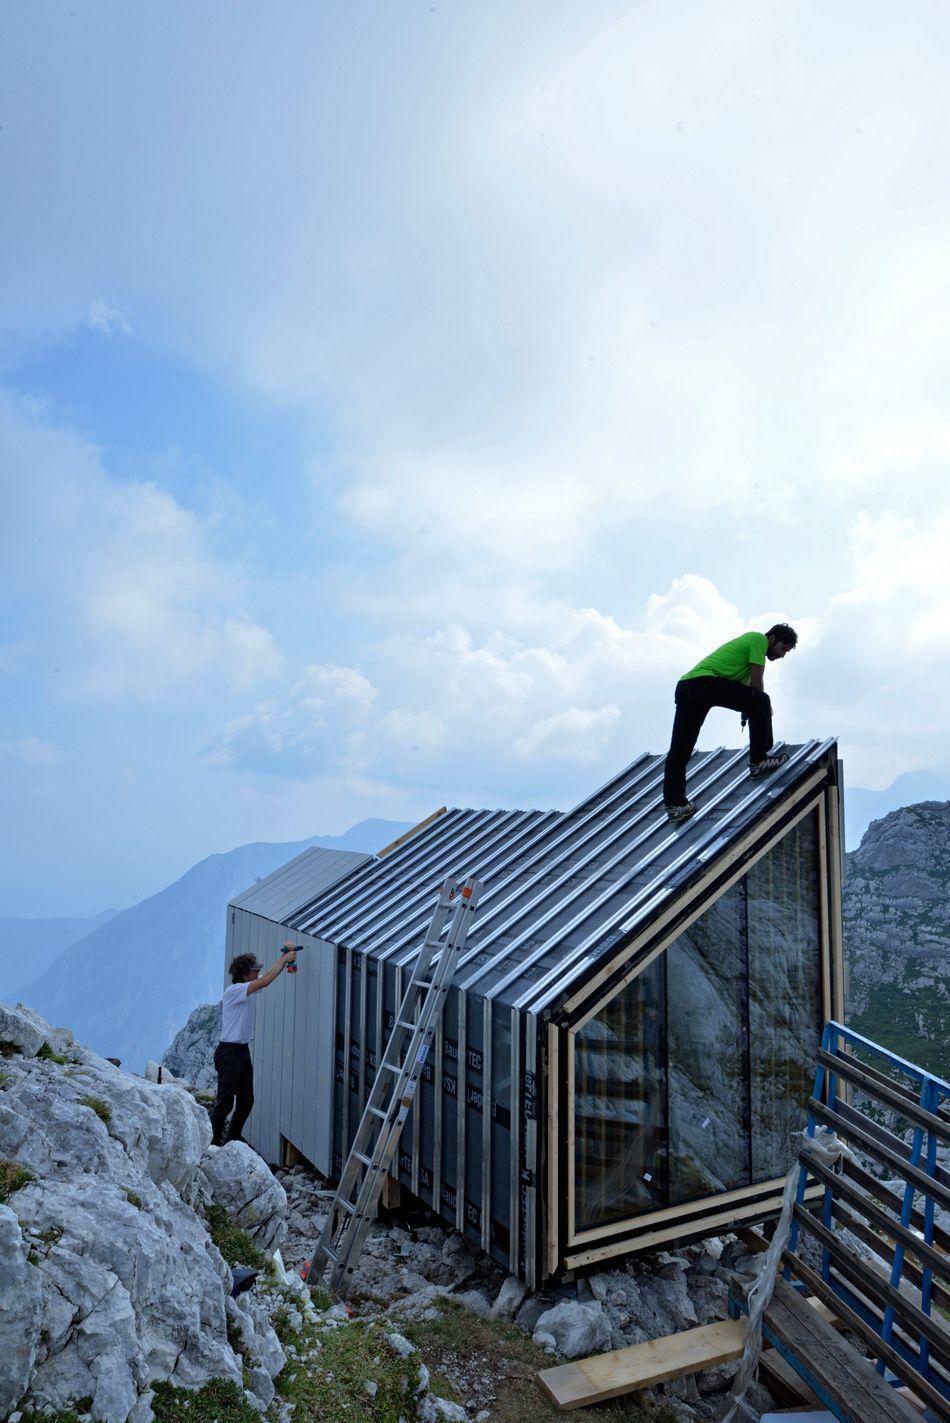 Mountain Architects Hendricks: OFIS Constructs Alpine Shelter For Climbers Of Skuta